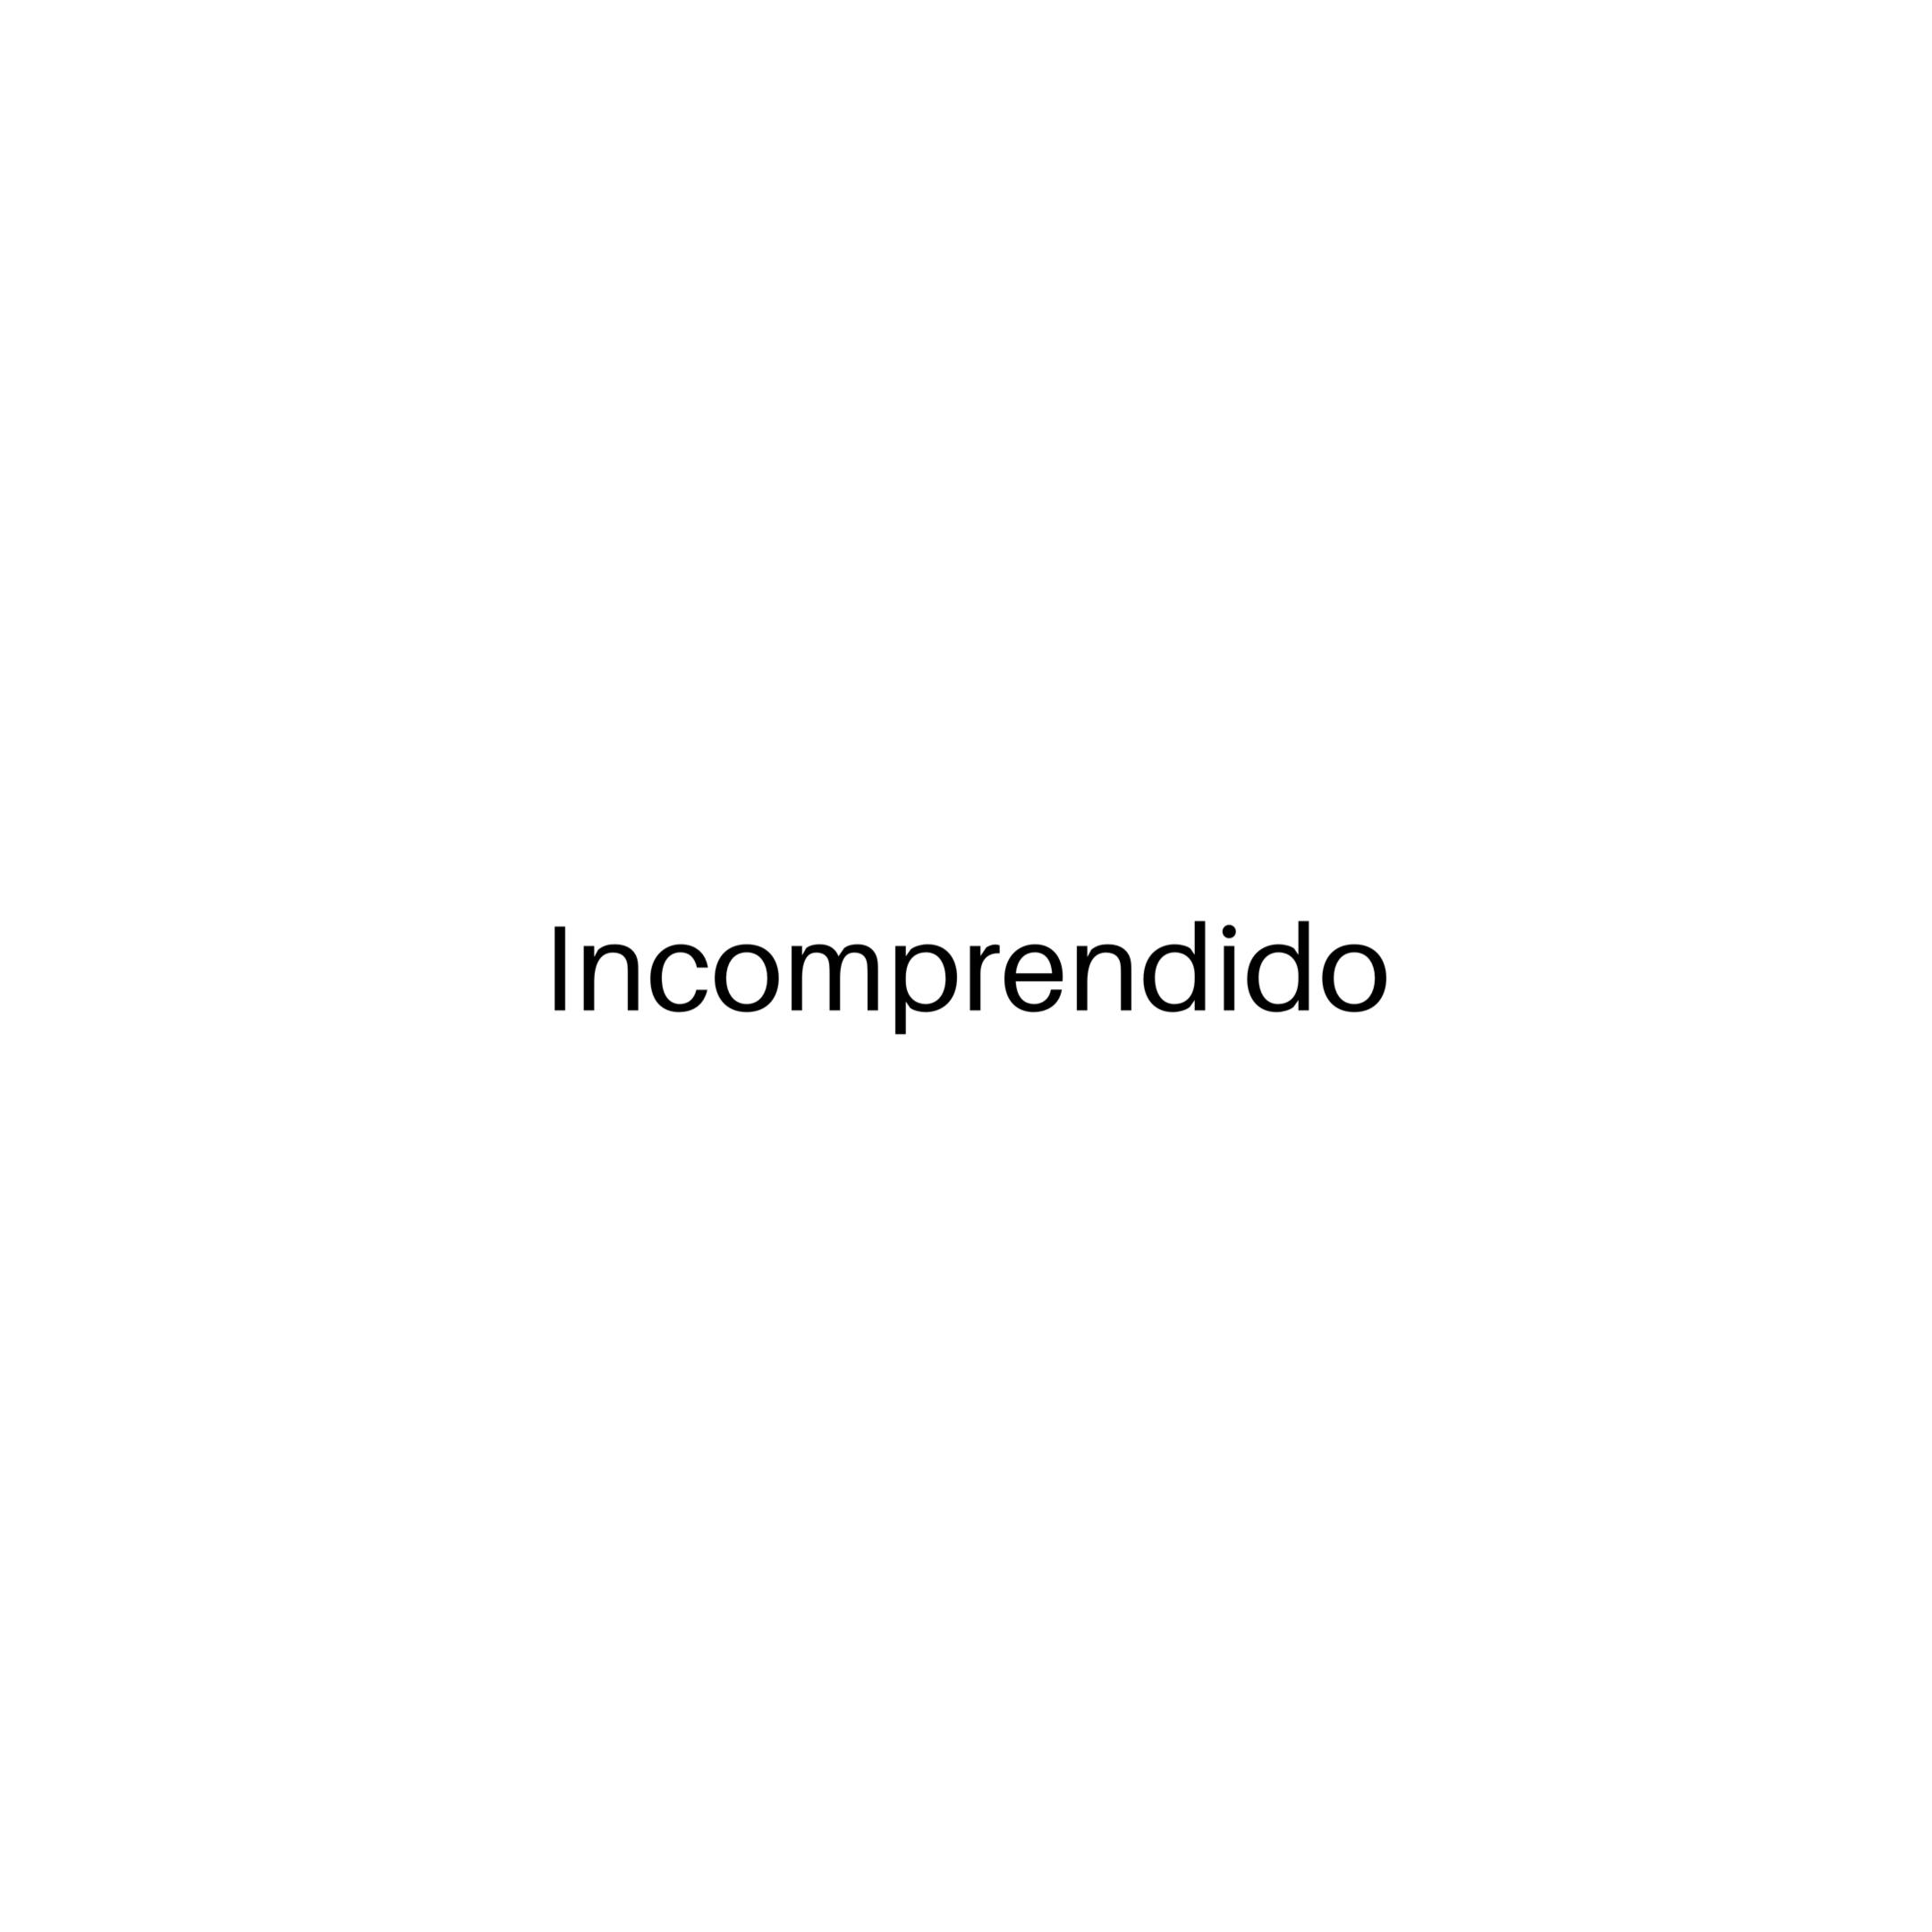 INCOMPRENDIDA